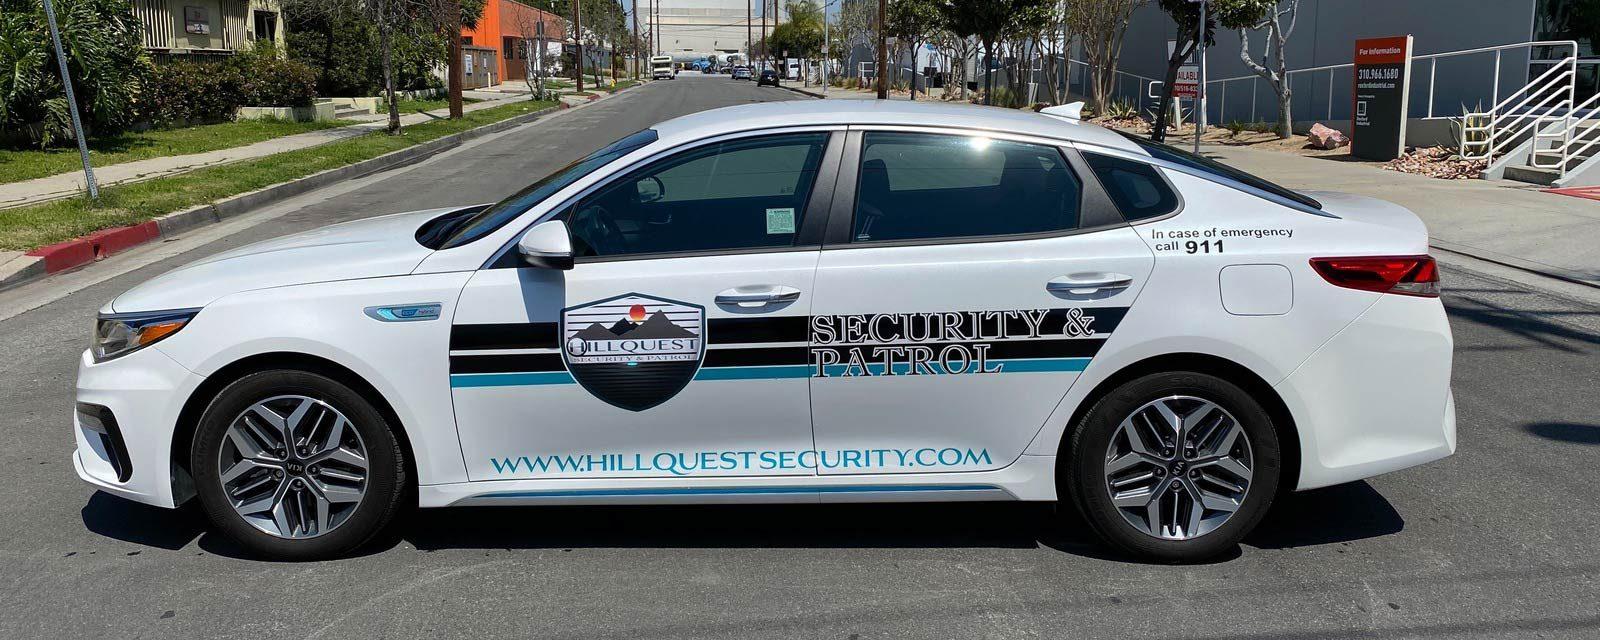 mobile patrol security companies los angeles